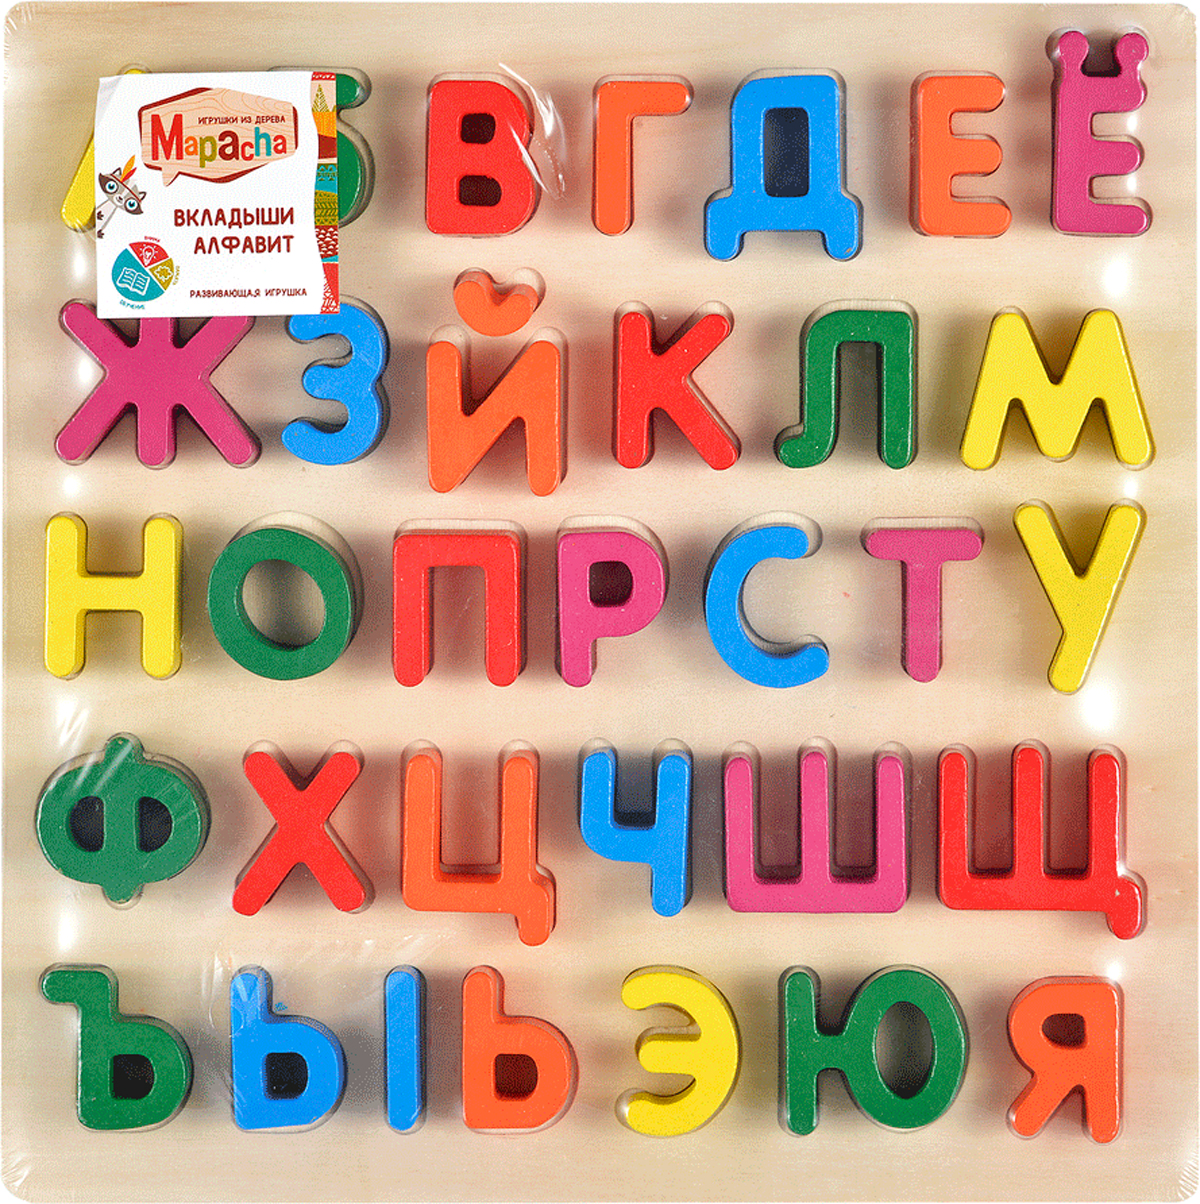 Mapacha Пазл для малышей Вкладыши Алфавит mapacha пазл для малышей вкладыши формы и цвета